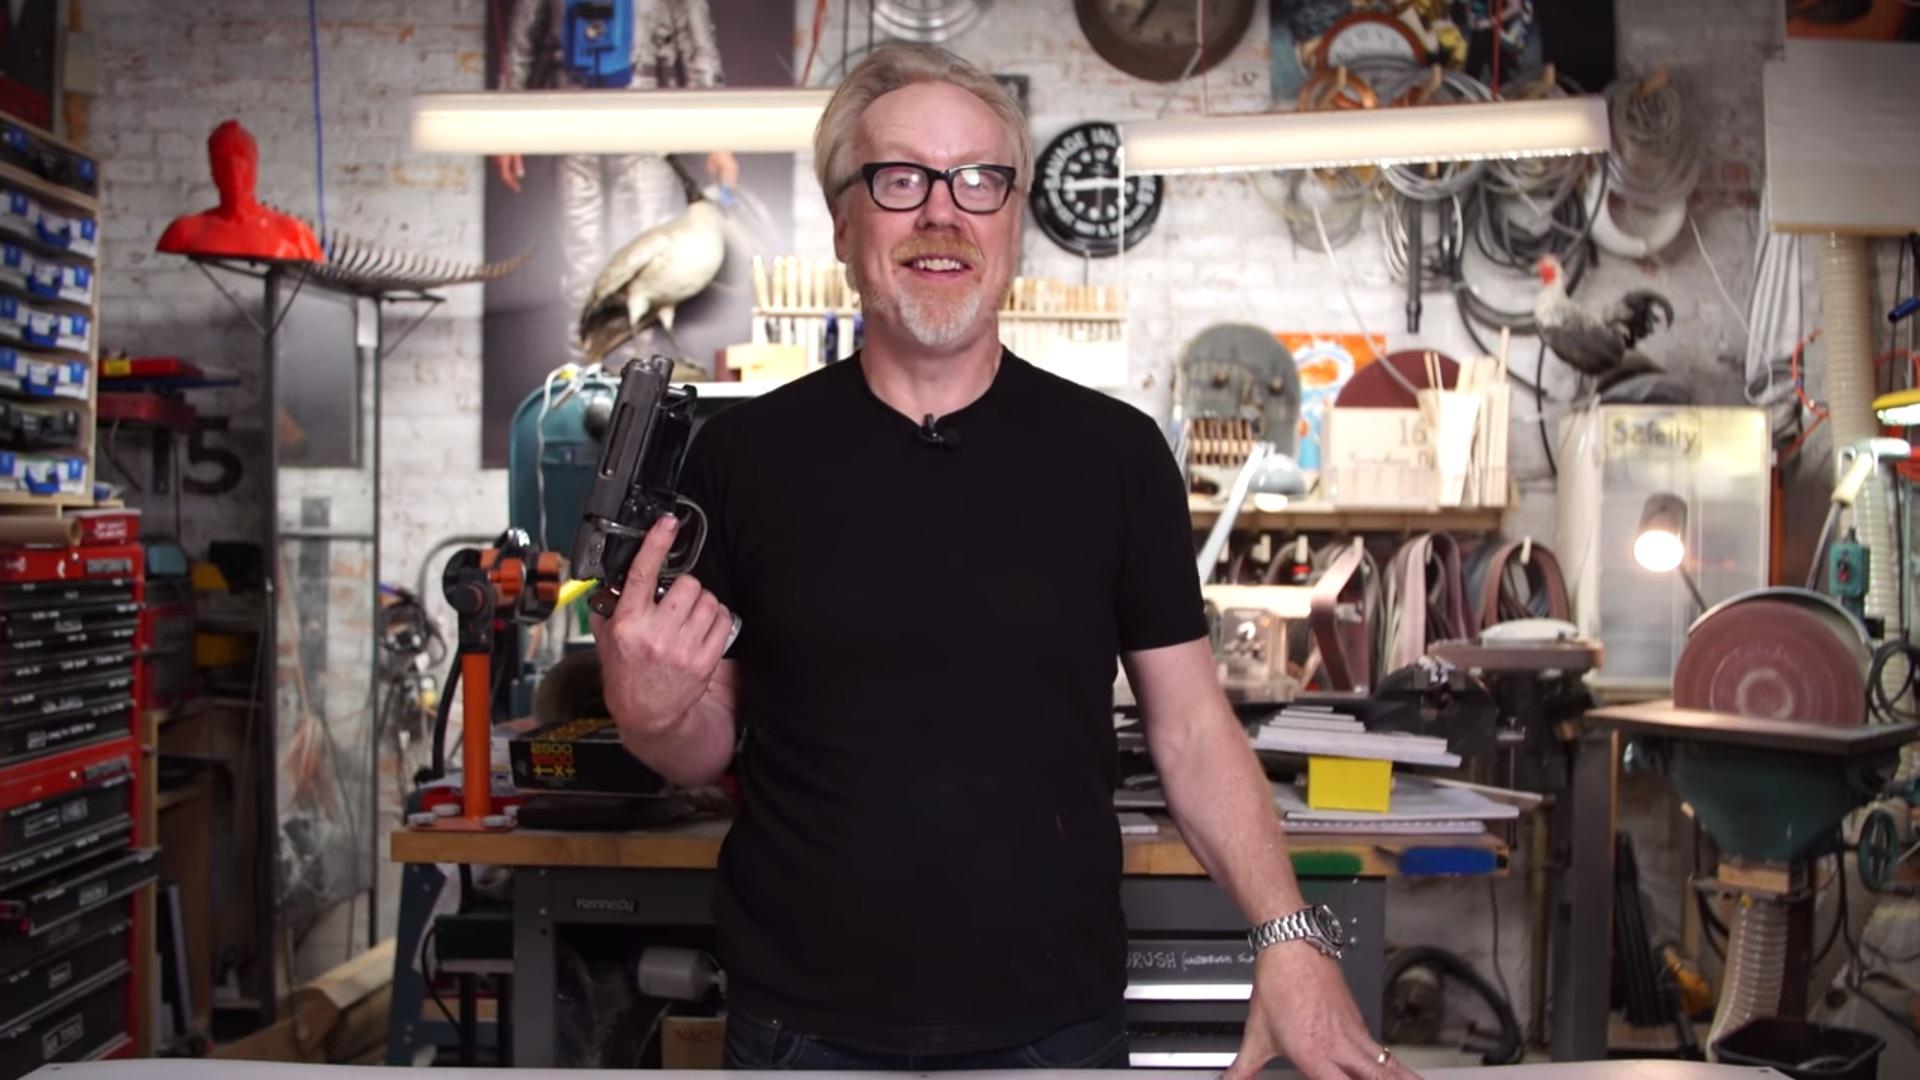 watch-adam-savage-showcase-a-sick-30-replica-blaster-from-blade-runner-social.jpg